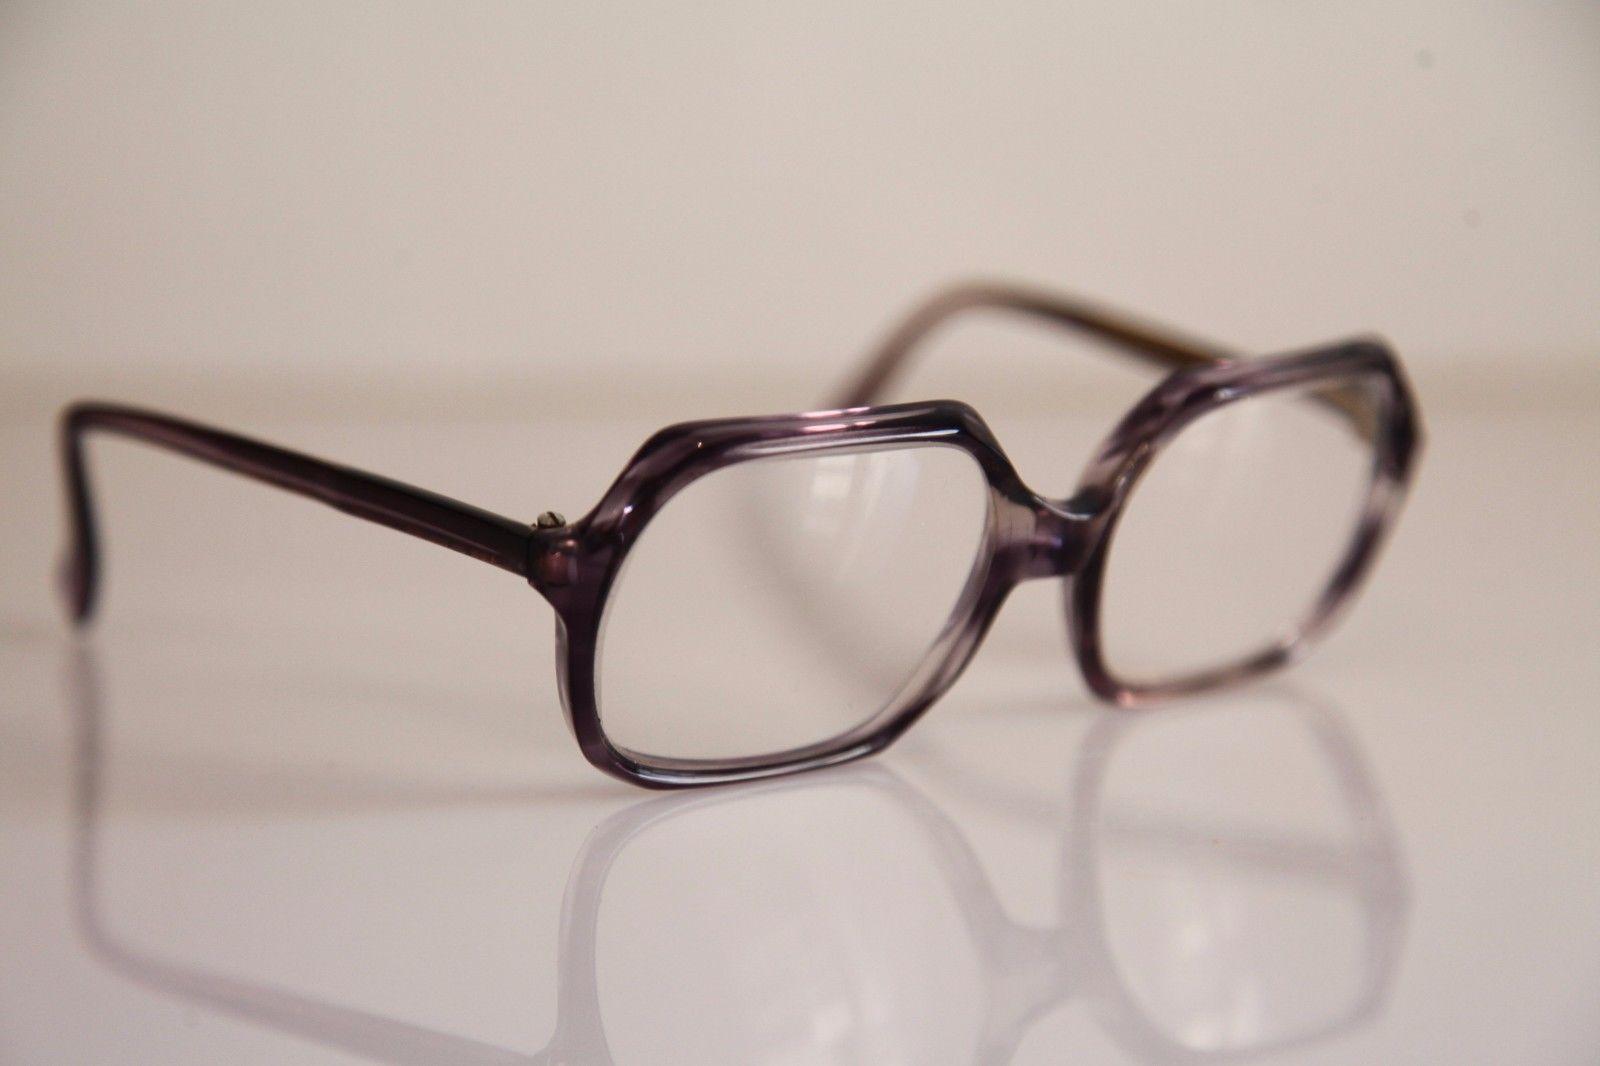 HARGA EVA Eyewear, Crystal Deep Purple Frame, RX-Able Prescription lens. FRANCE